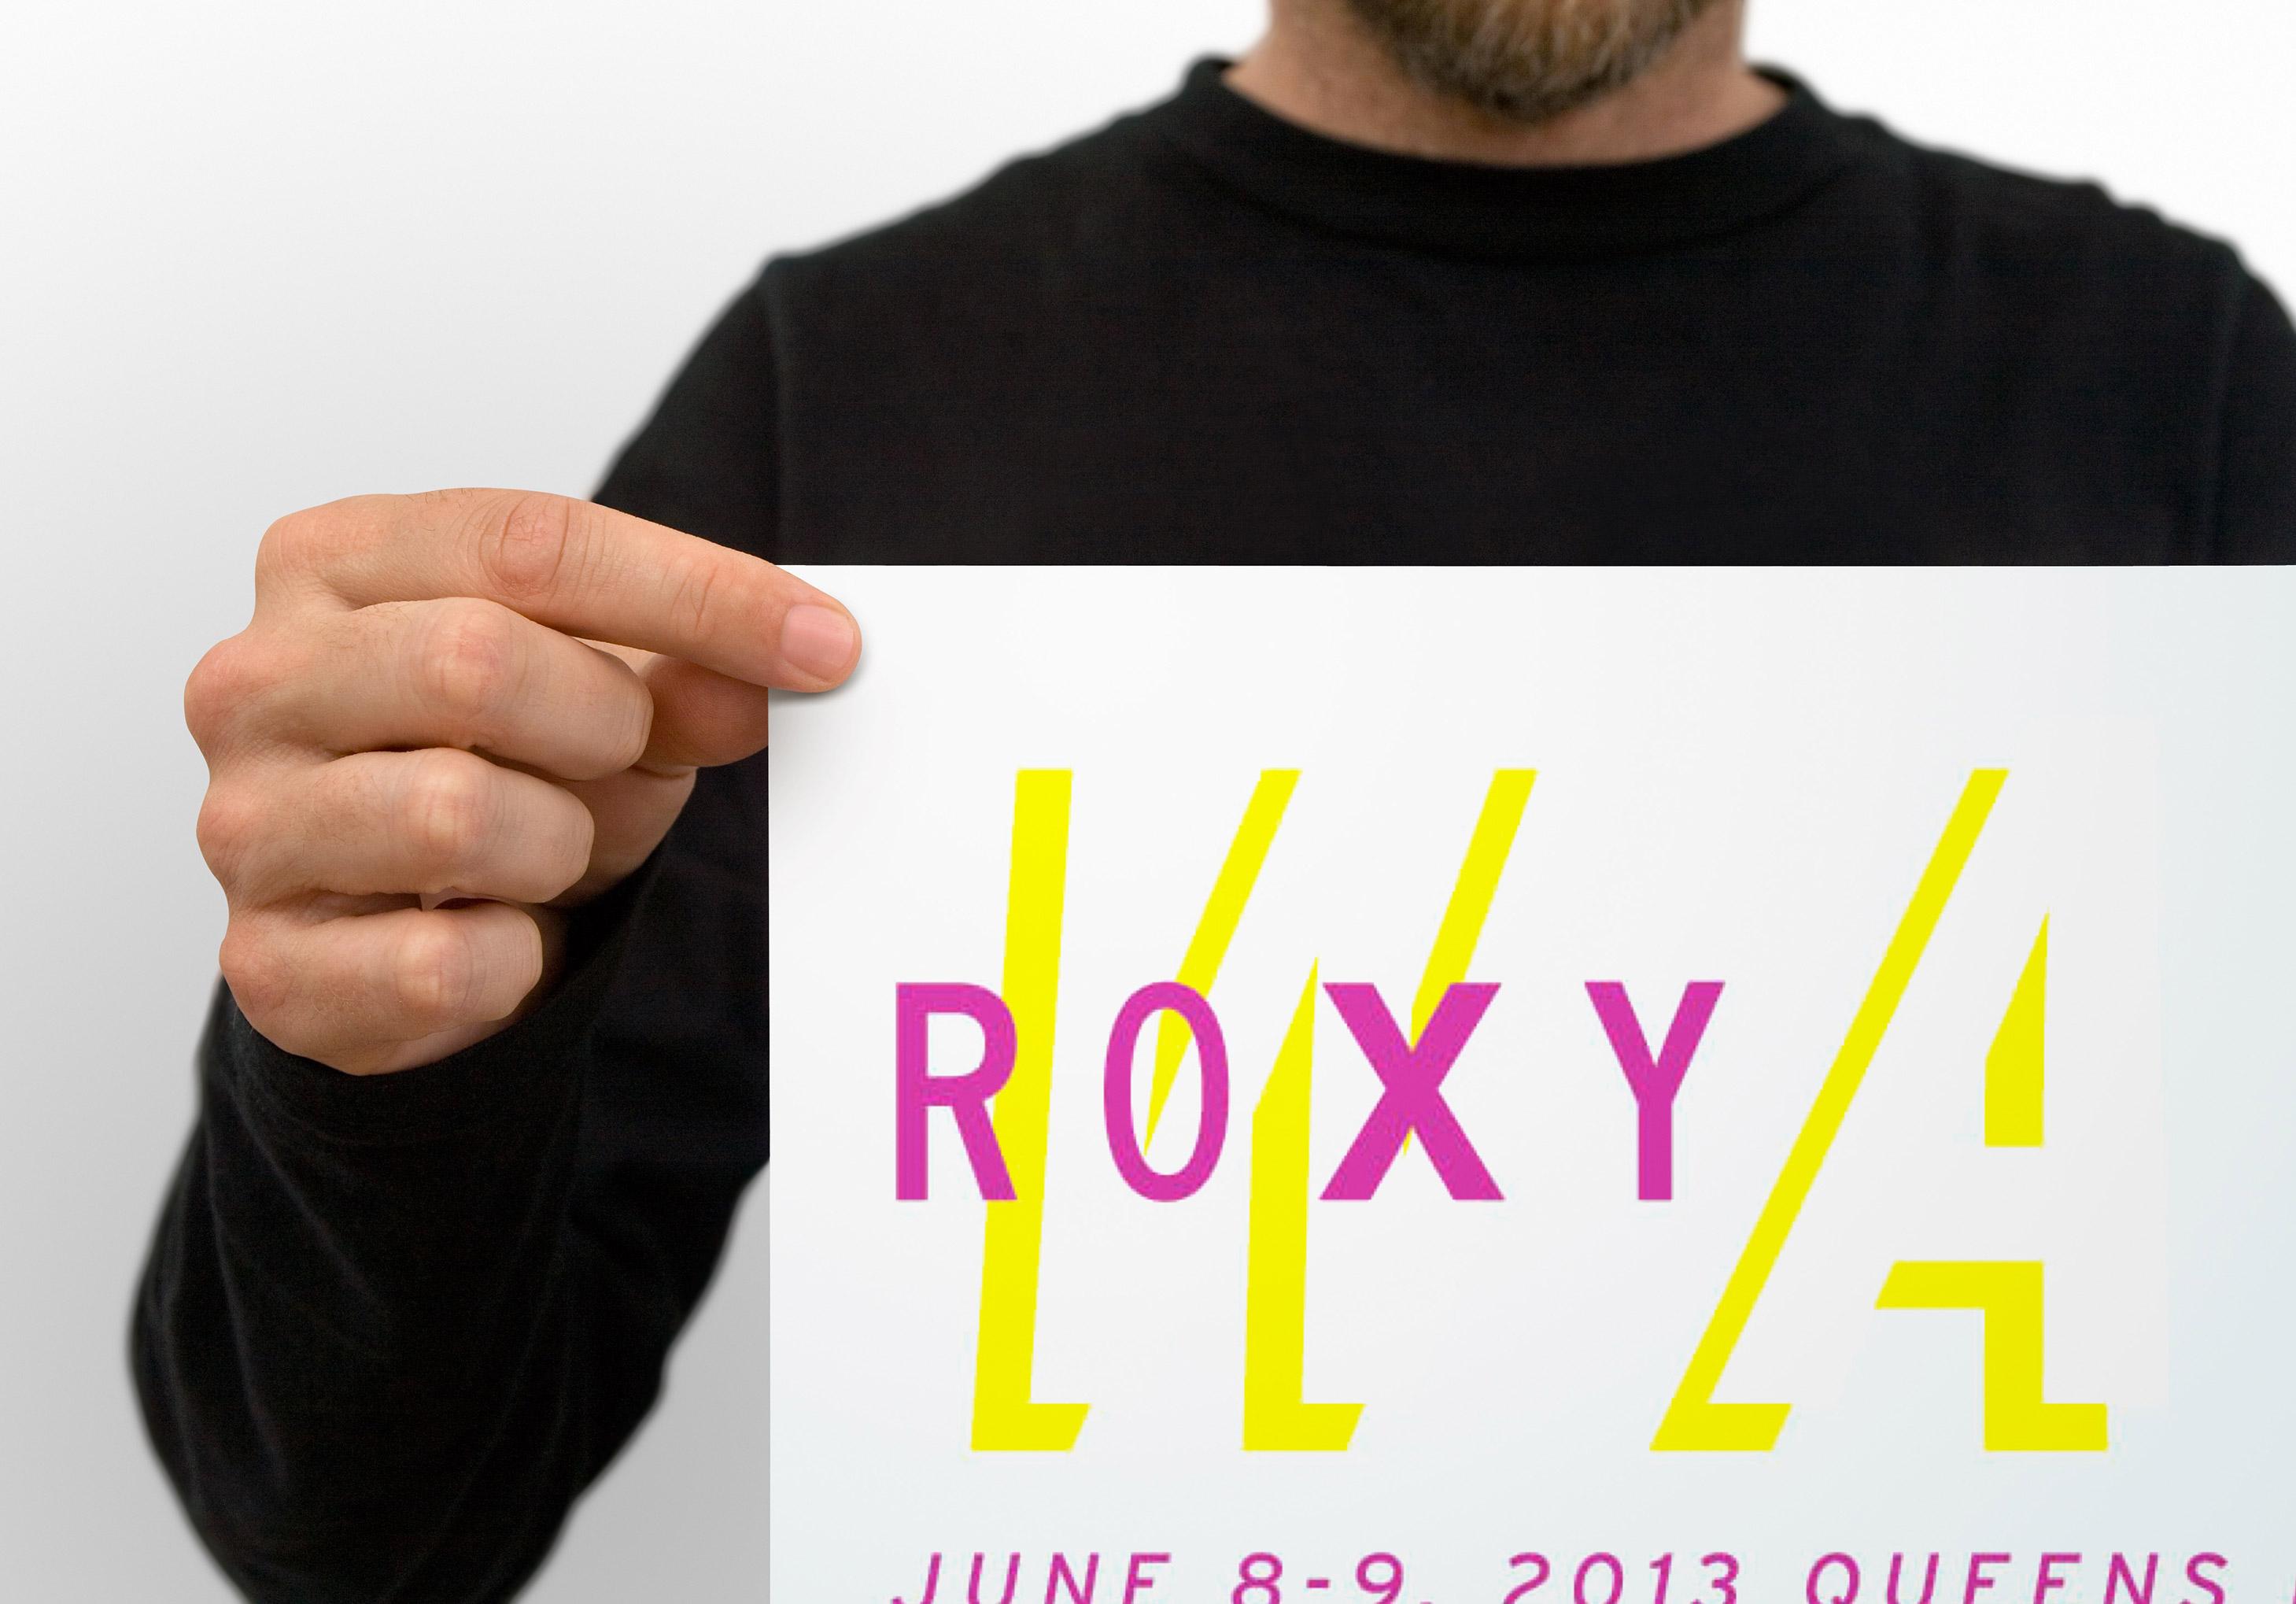 RX_WAIKIKI_poster_detail